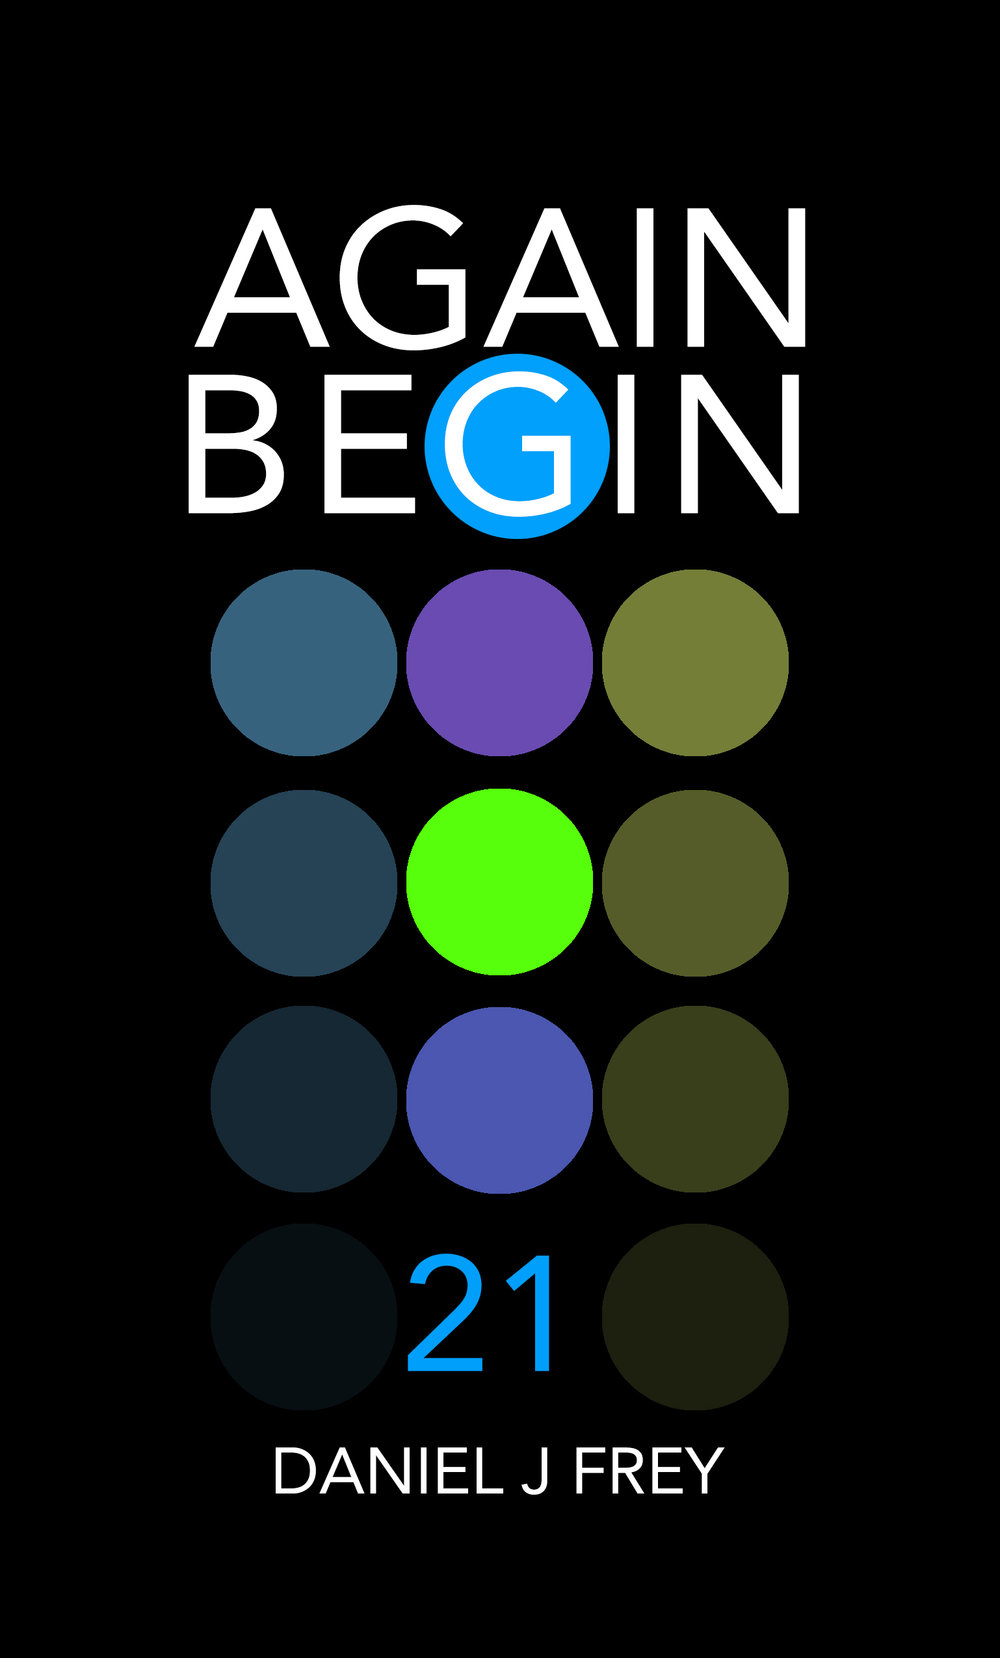 Again Begin 21 - God Less